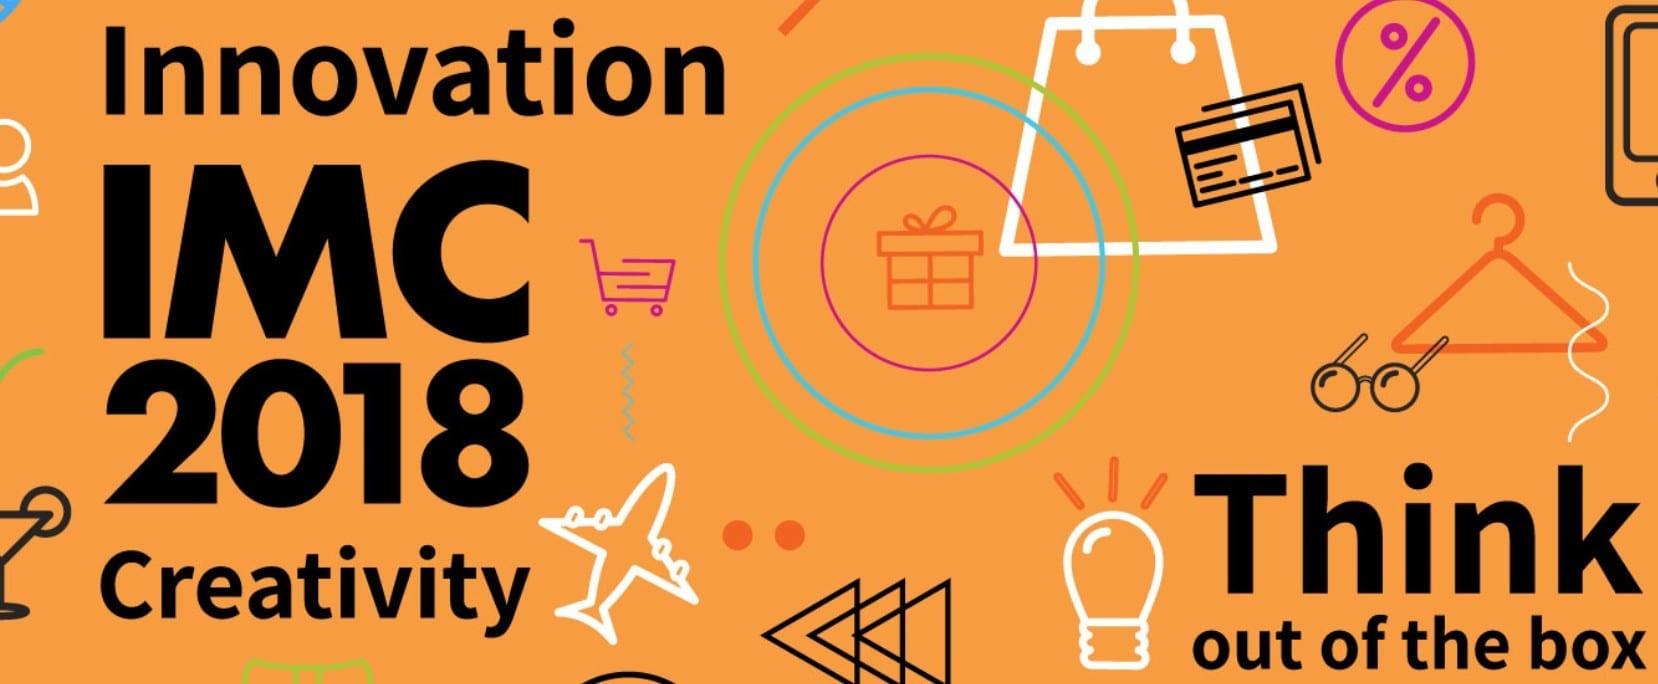 IMC2018 ועידת הקניונים ורשתות המסחר